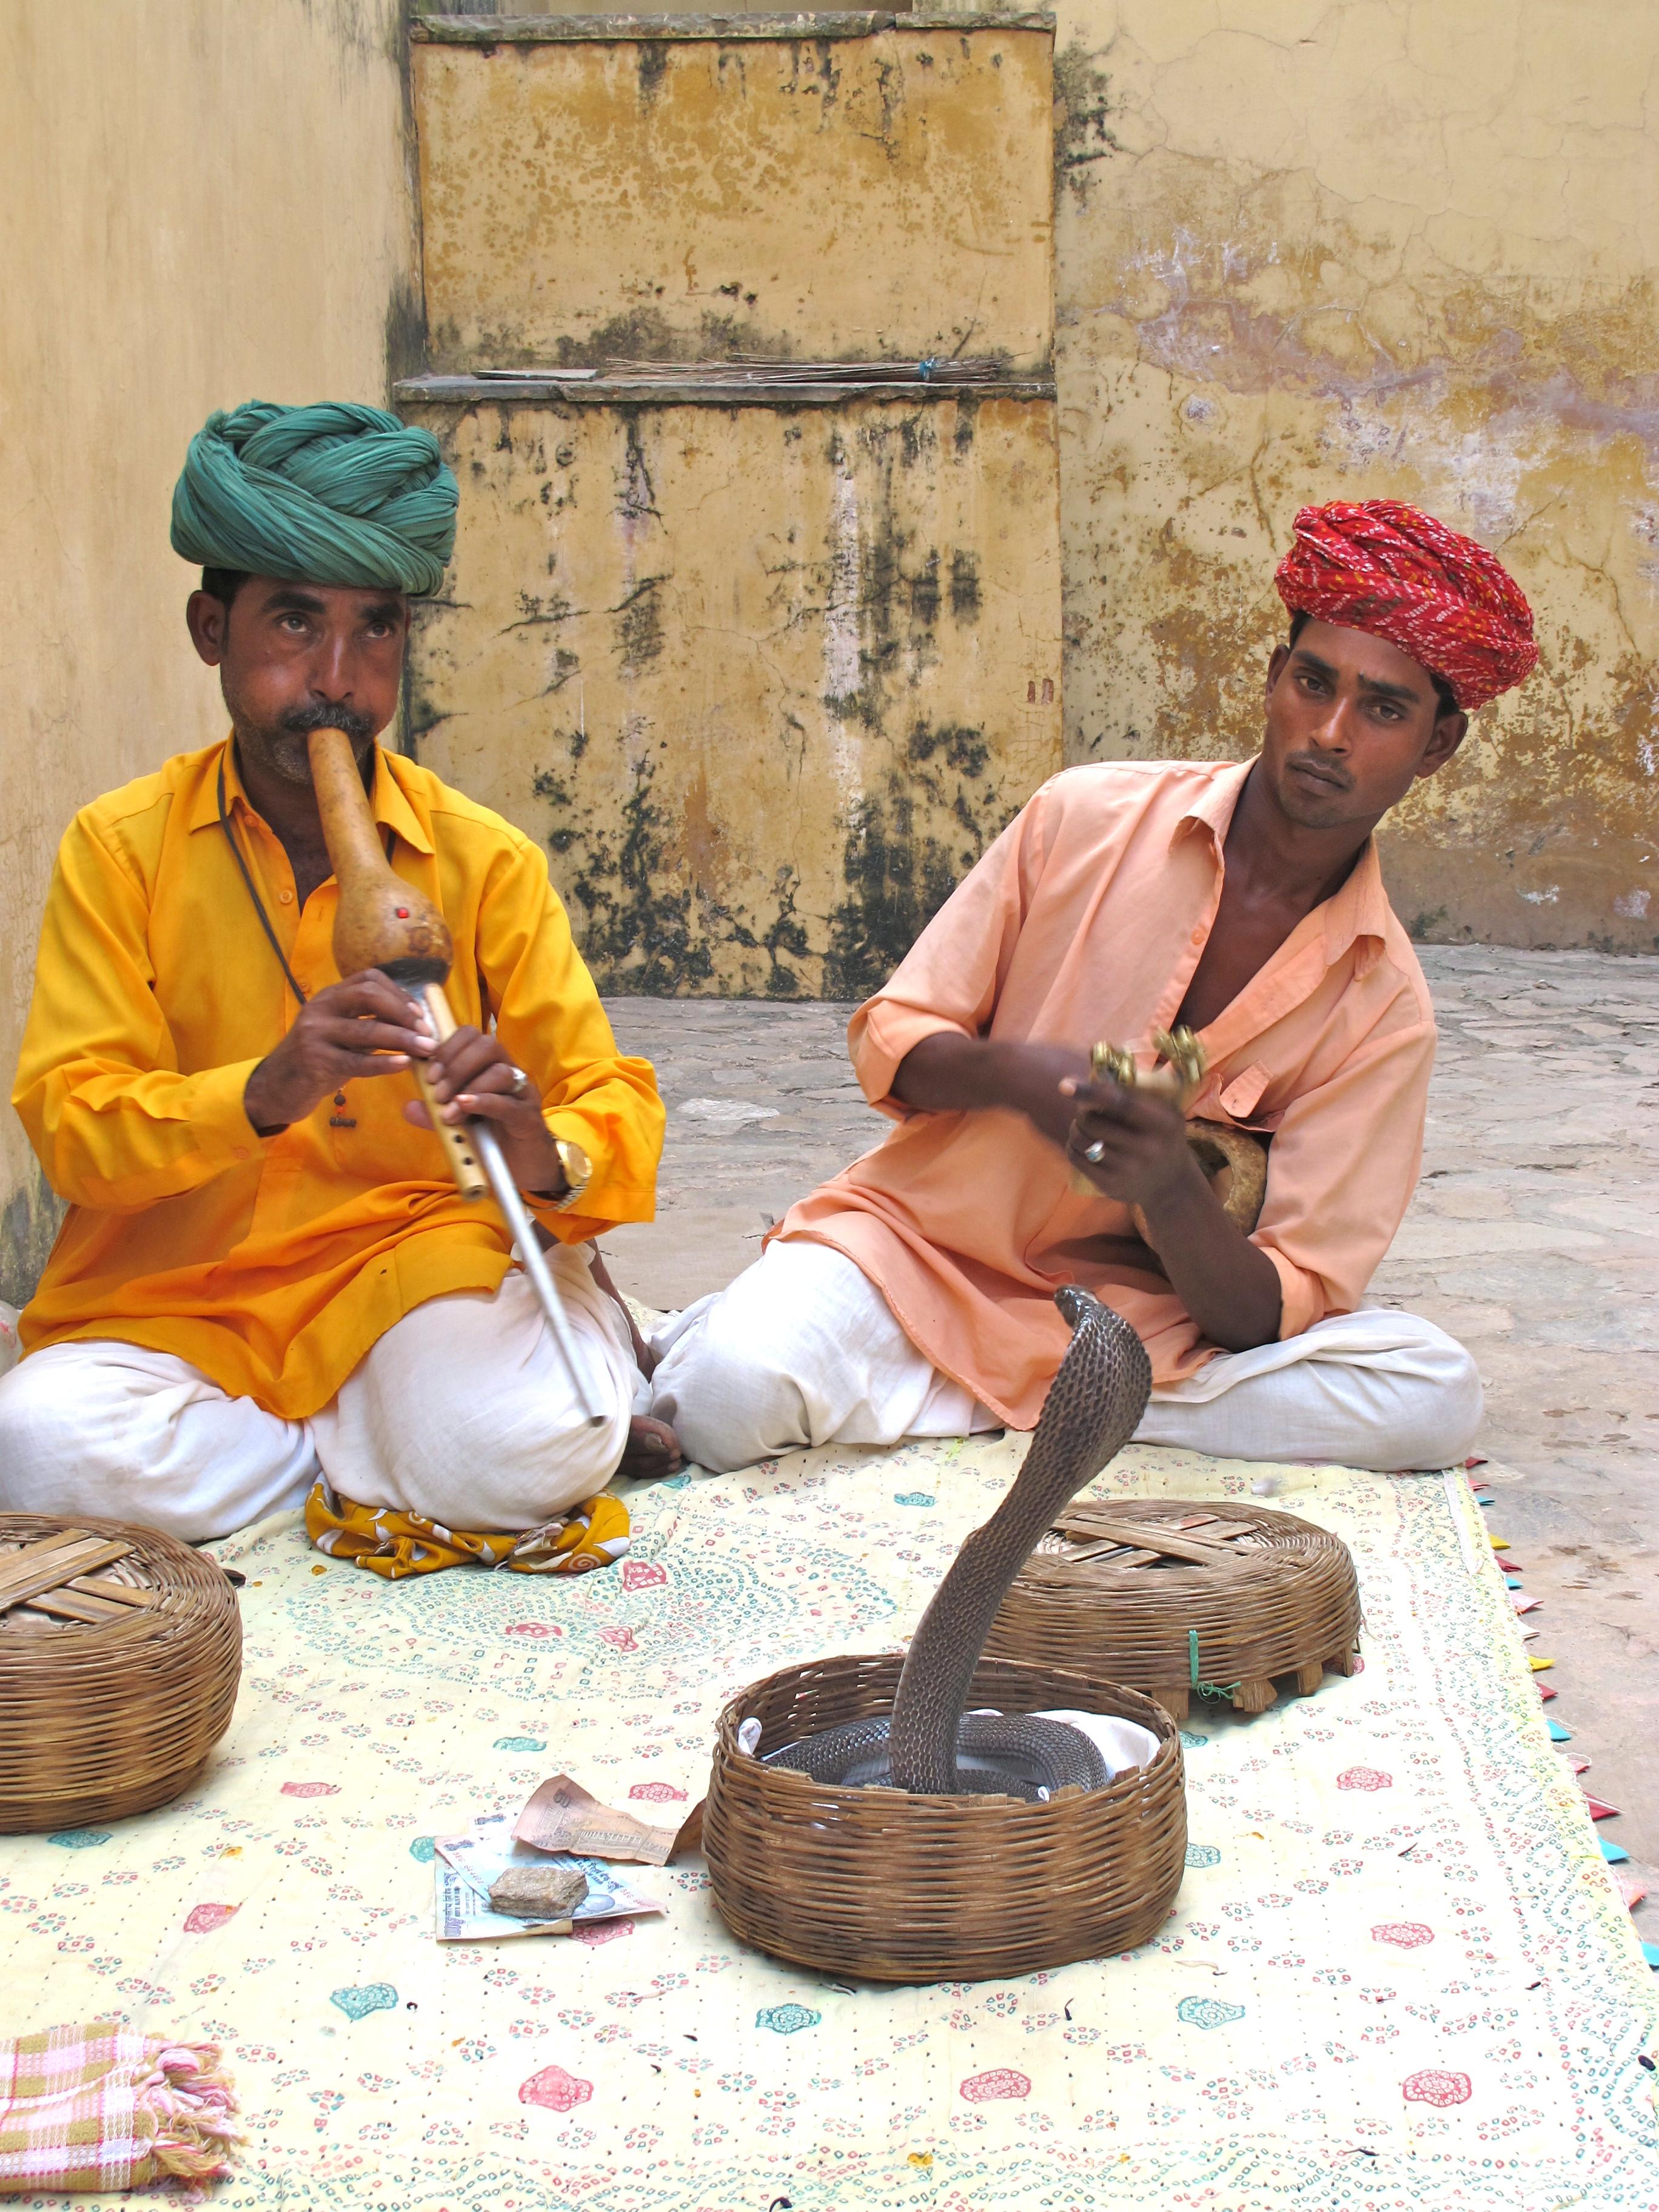 Snake charmers - City Palace - Jaipur - India